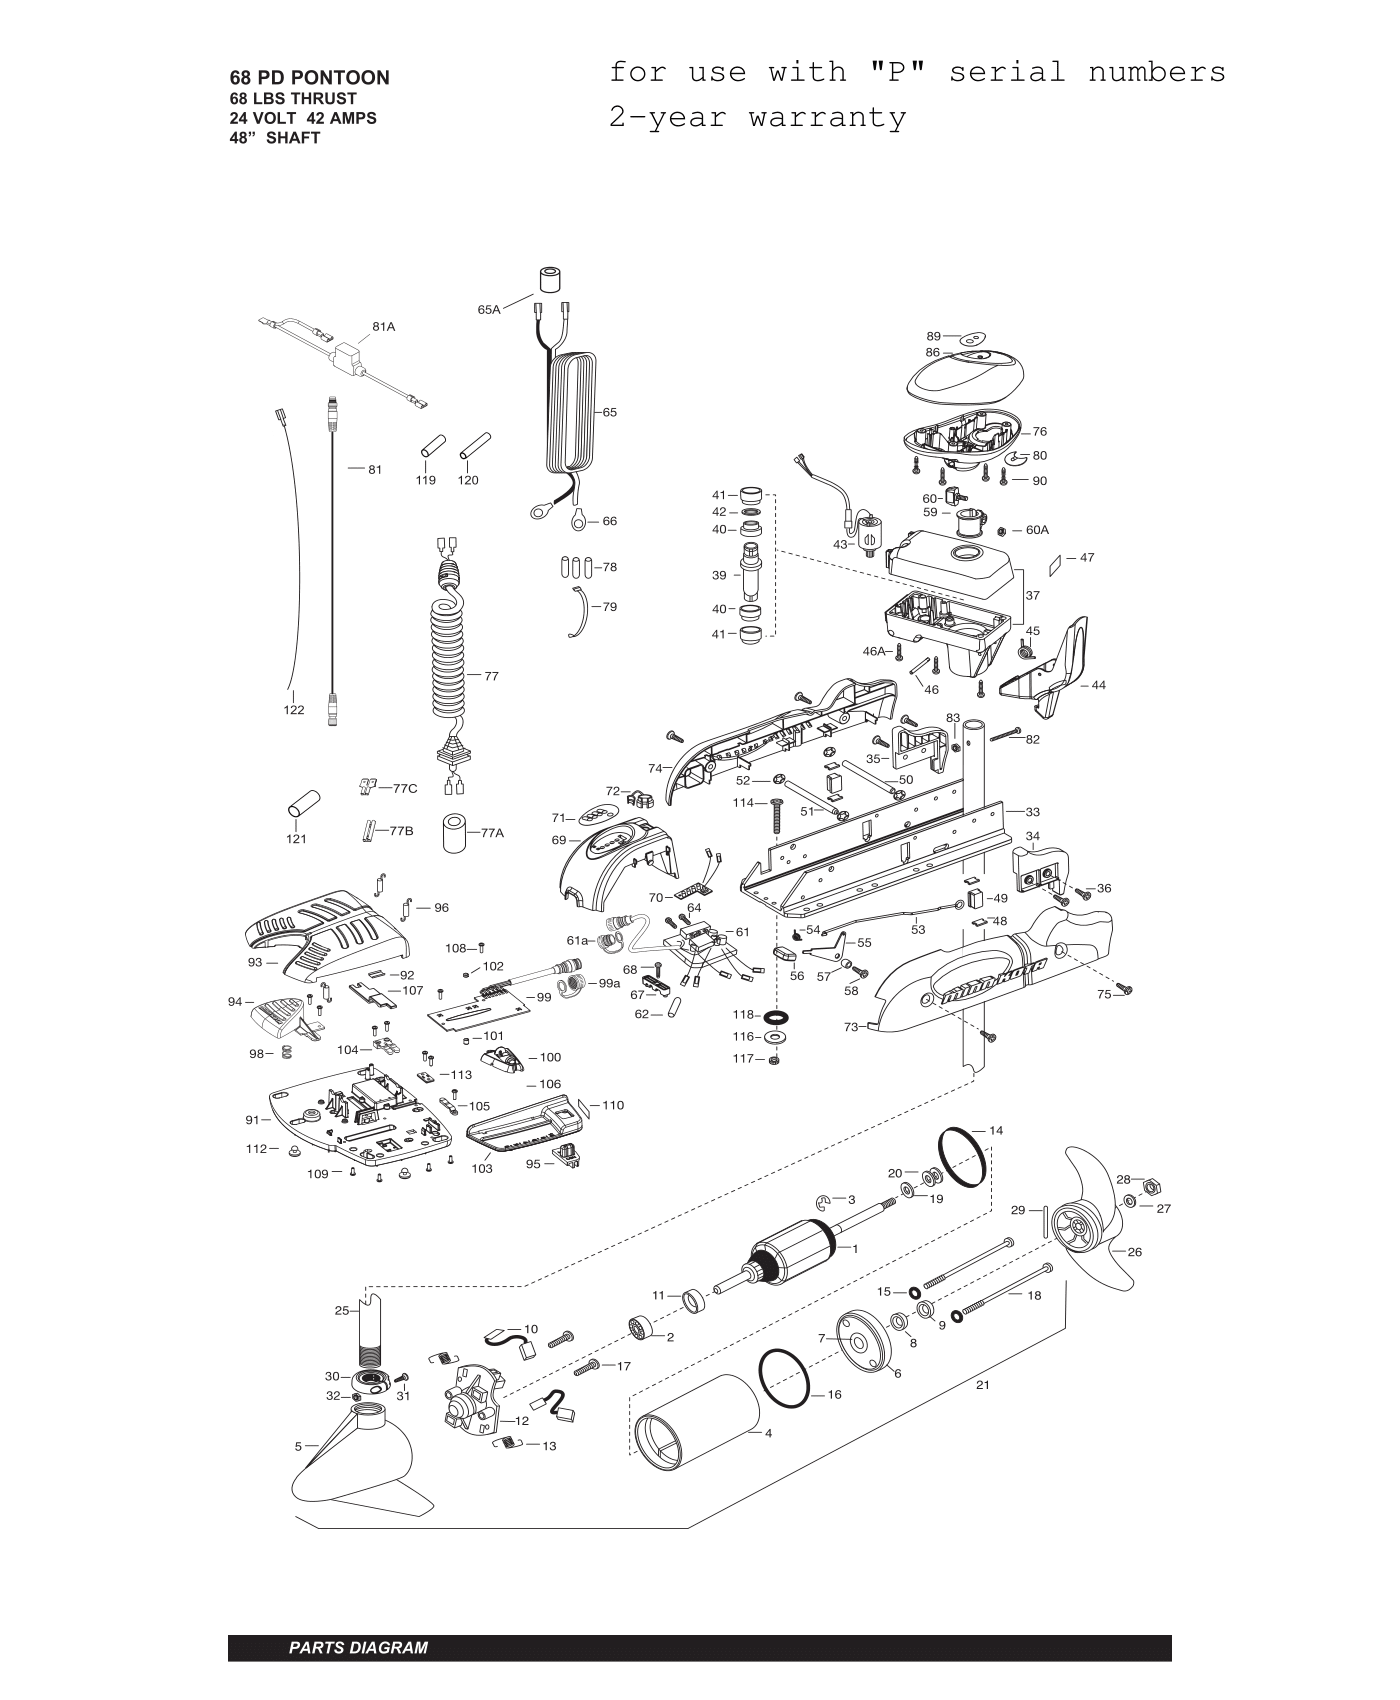 2015-mk-pontoonv268-1.png